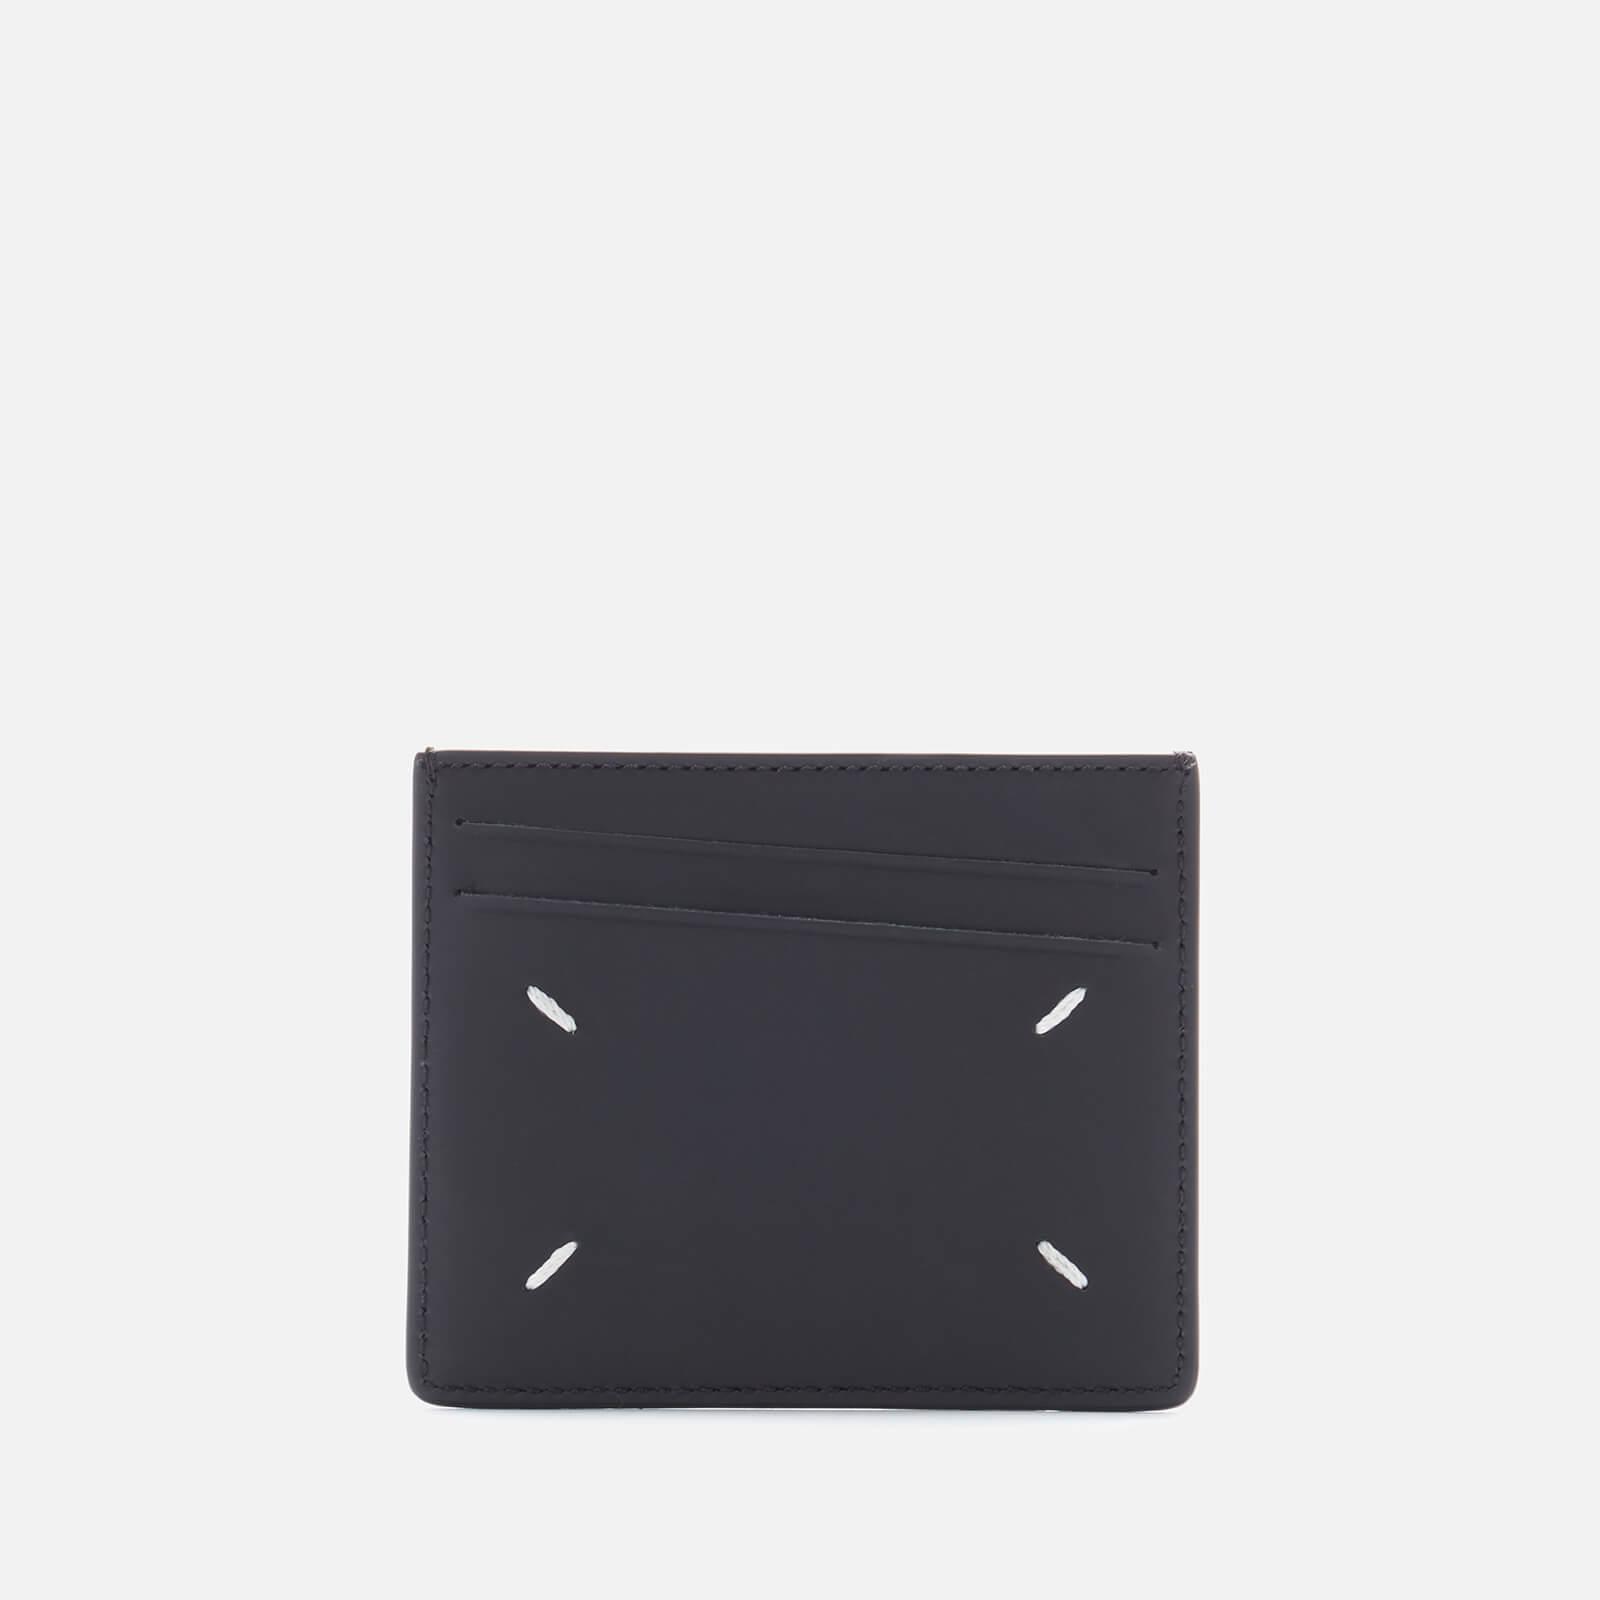 Maison Margiela Men's Leather Credit Card Case - Brown